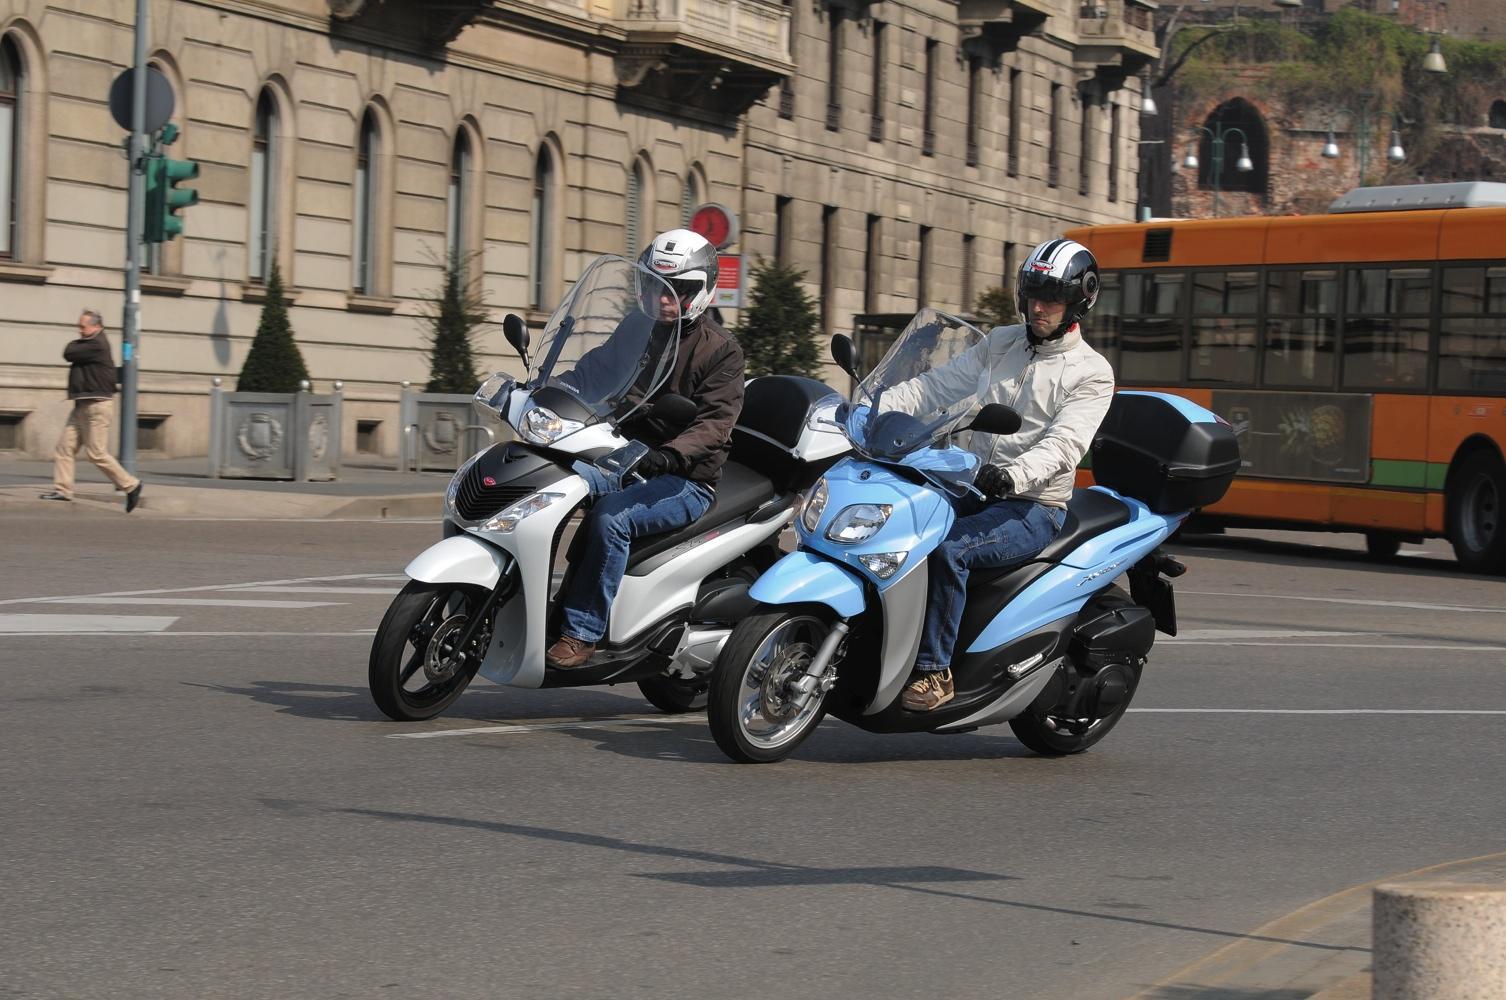 Prova Honda SH 125 e Yamaha Xenter 125, scooter da città a